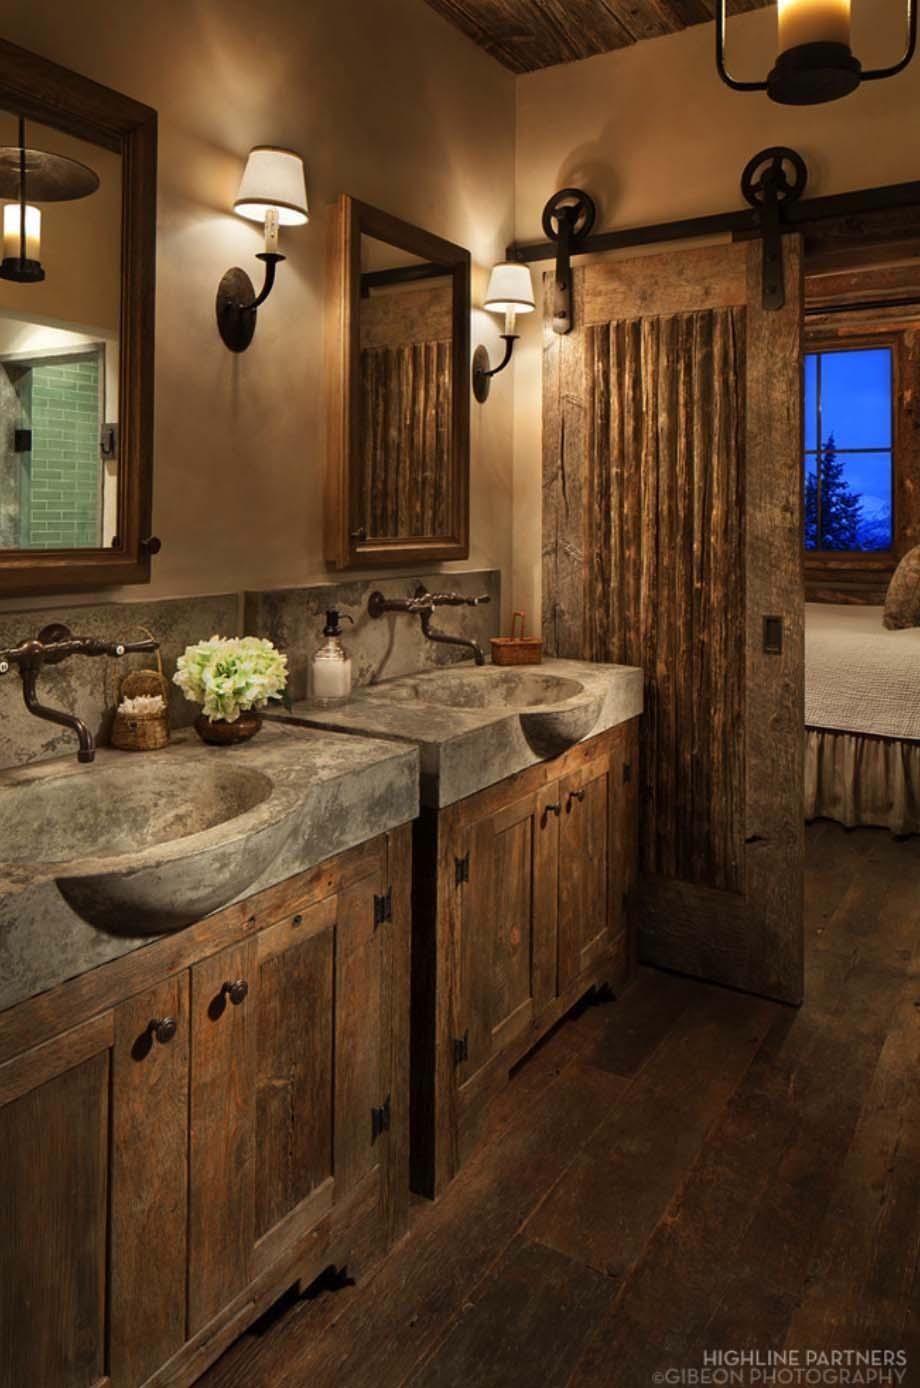 Modern Rustic Bathroom Décor with Concrete Sinks and Barn Door rustic bathroom decor ideas